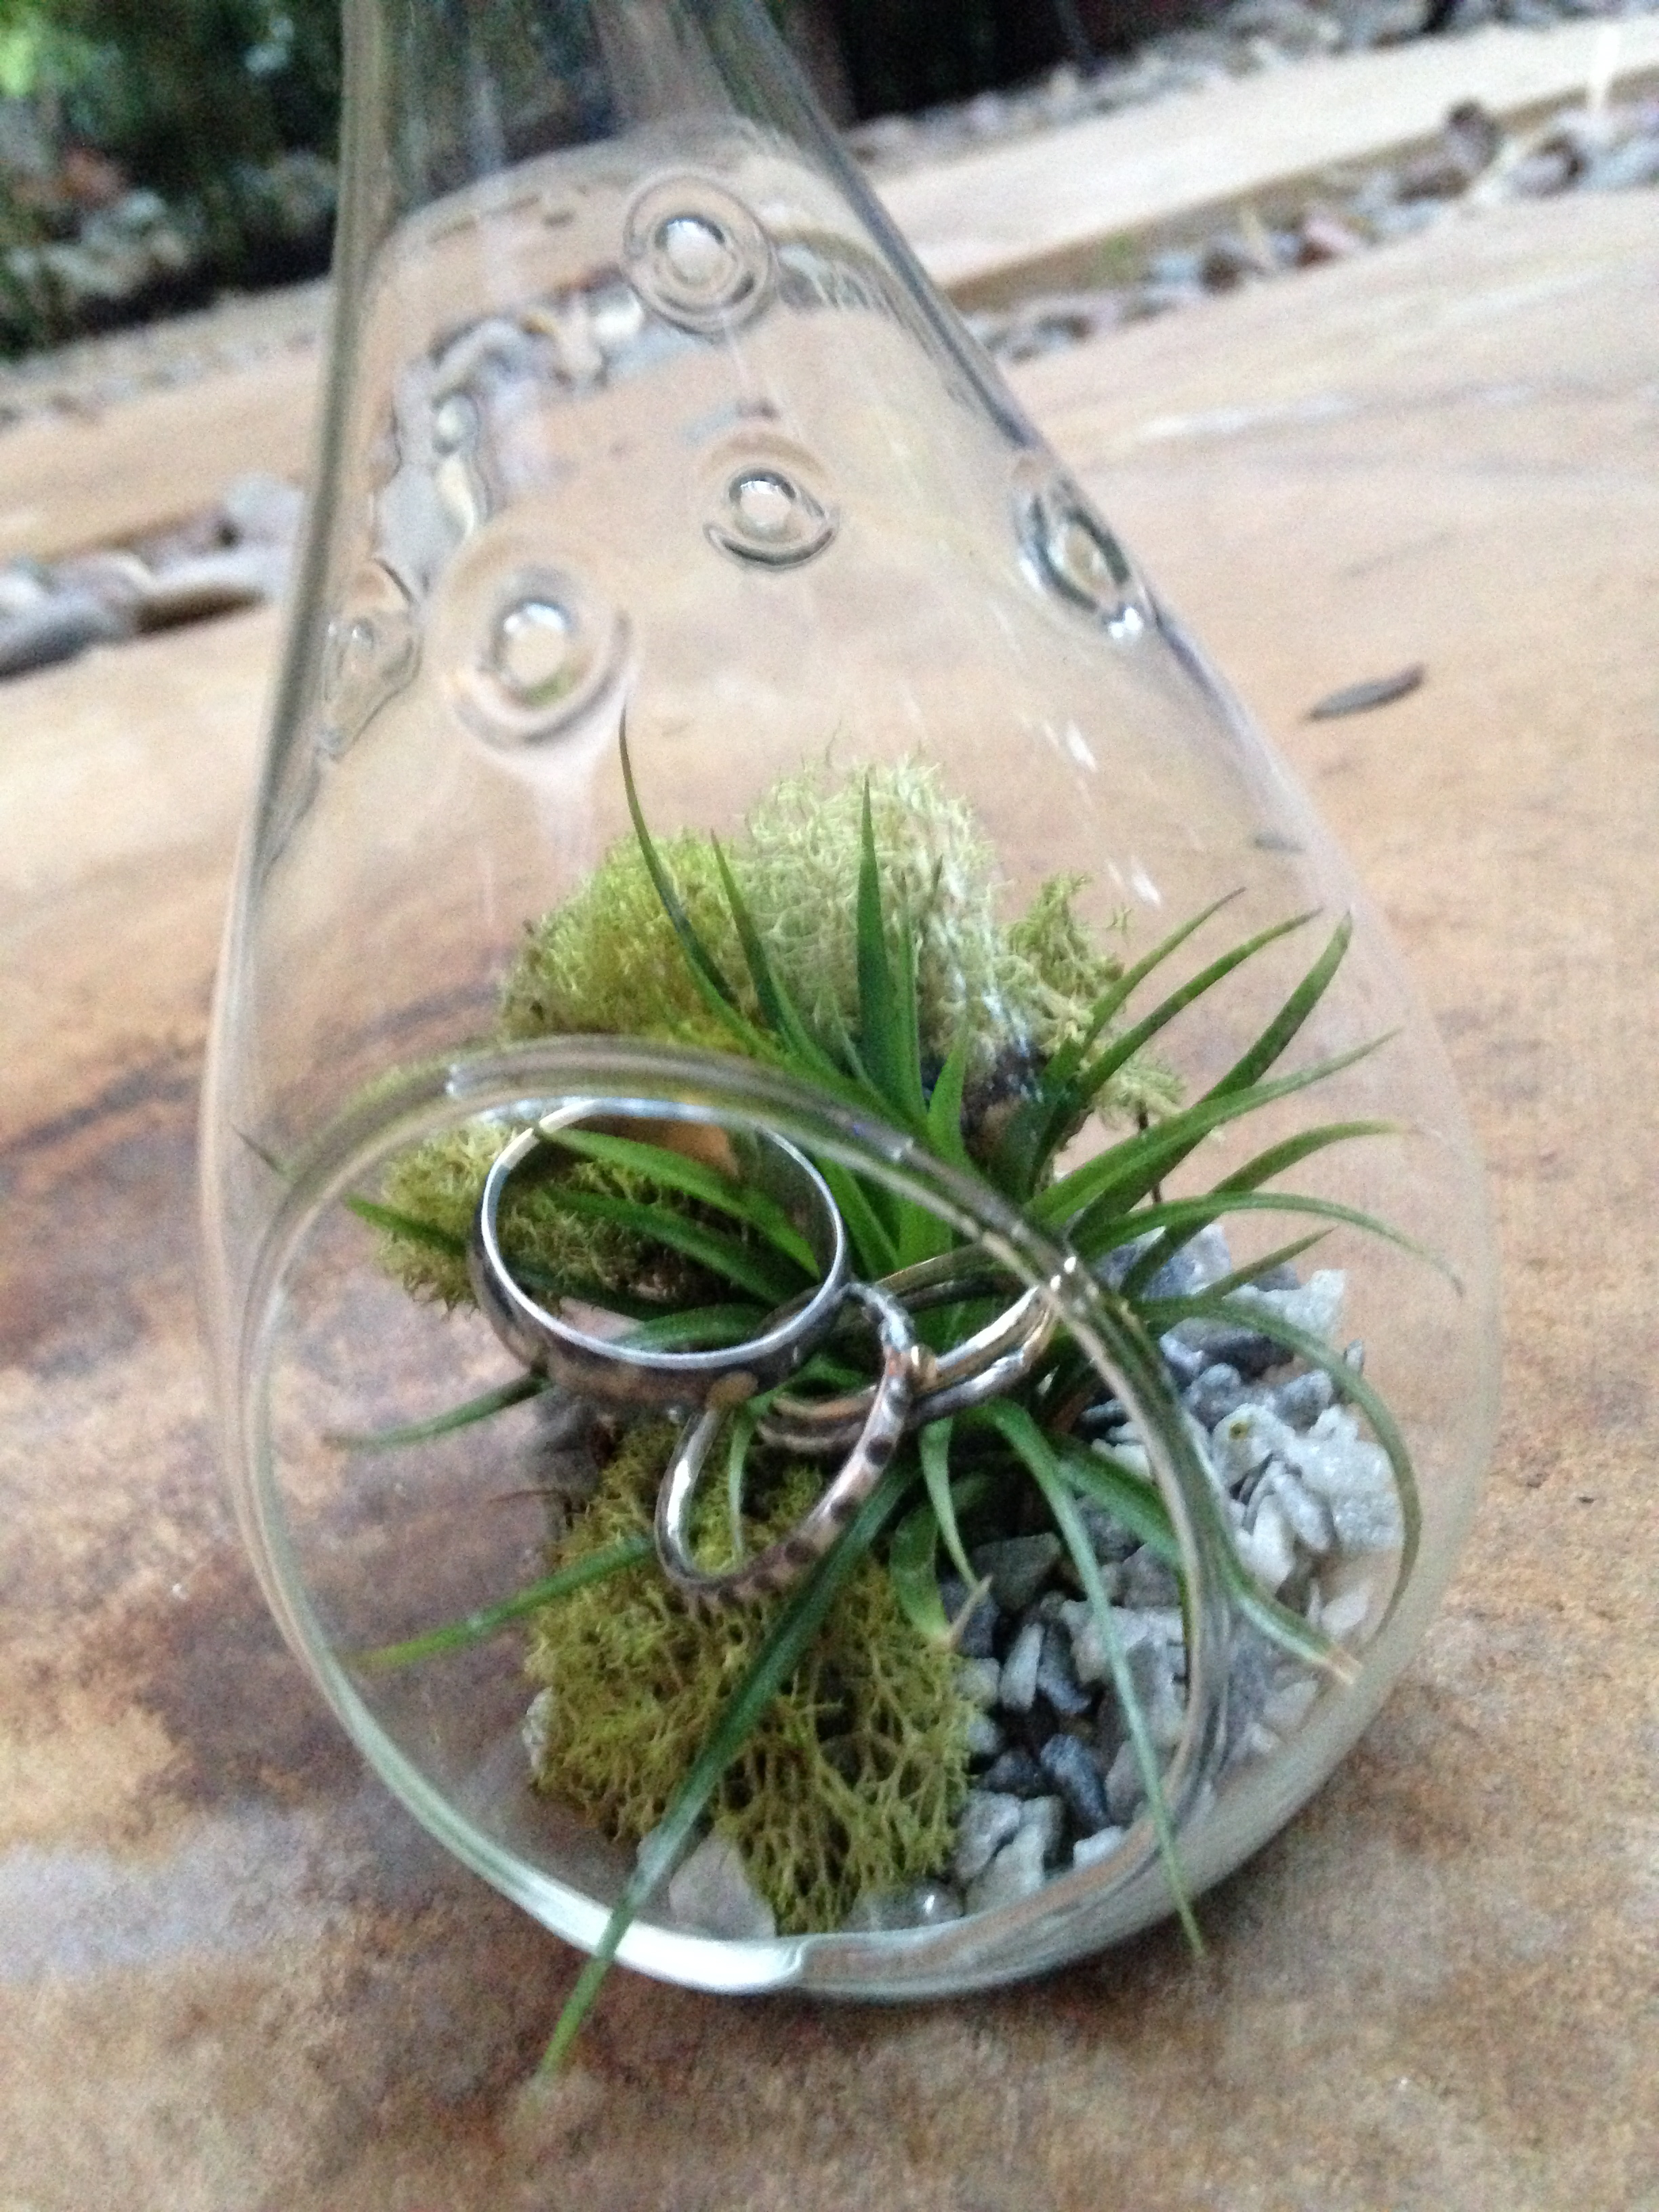 Presented them their rings in this mini-terrarium!